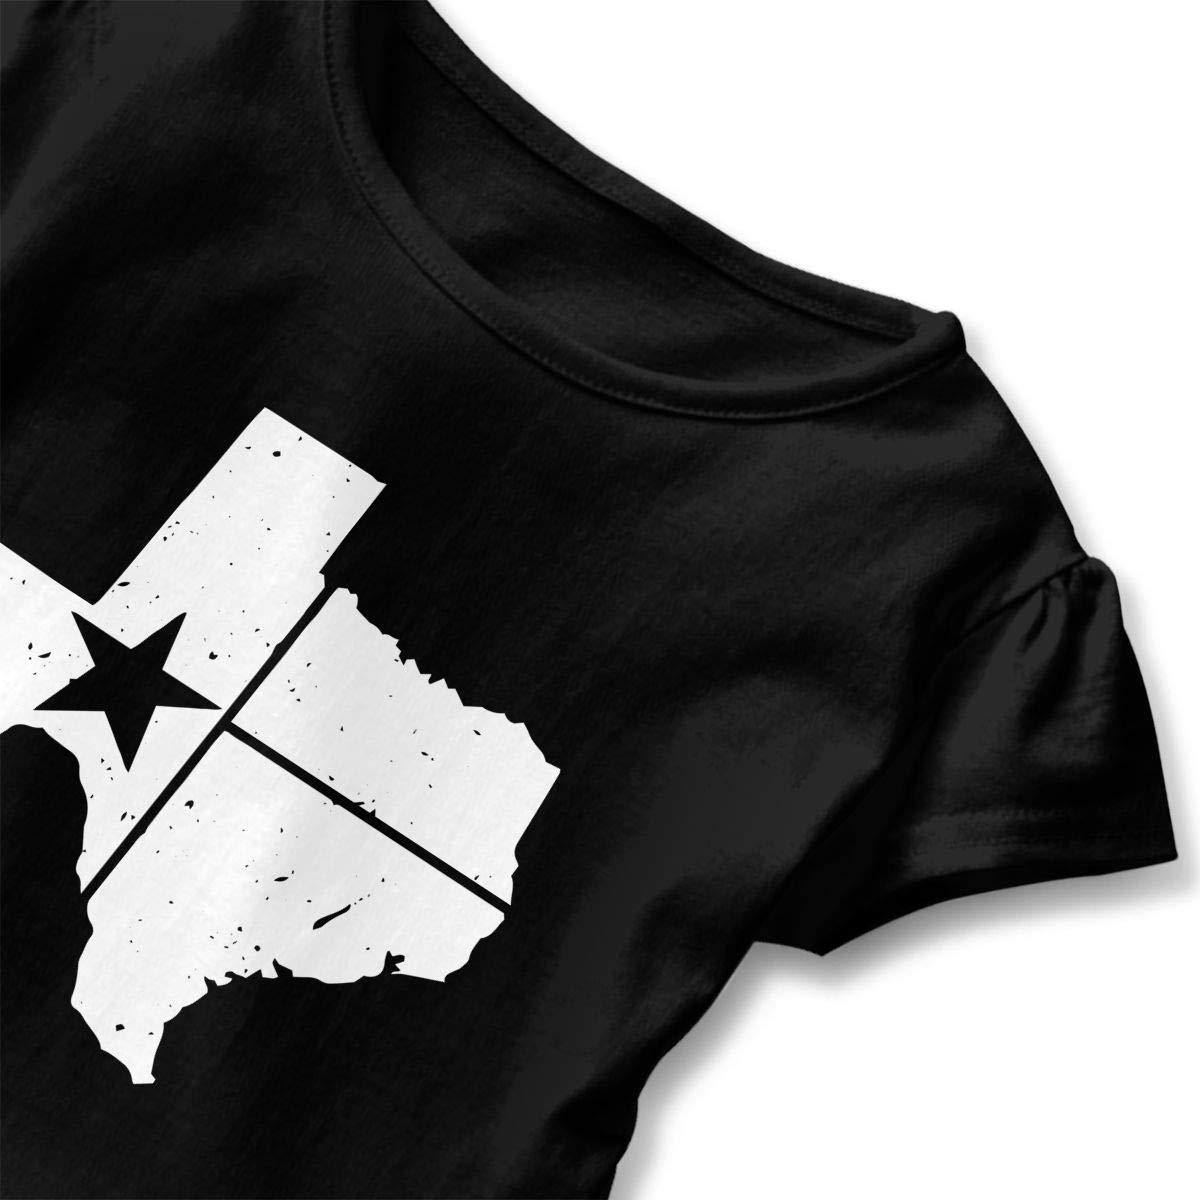 SHIRT1-KIDS Distressed White Texas State Flag Childrens Girls Short Sleeve T-Shirts Ruffles Shirt Tee Jersey for 2-6T